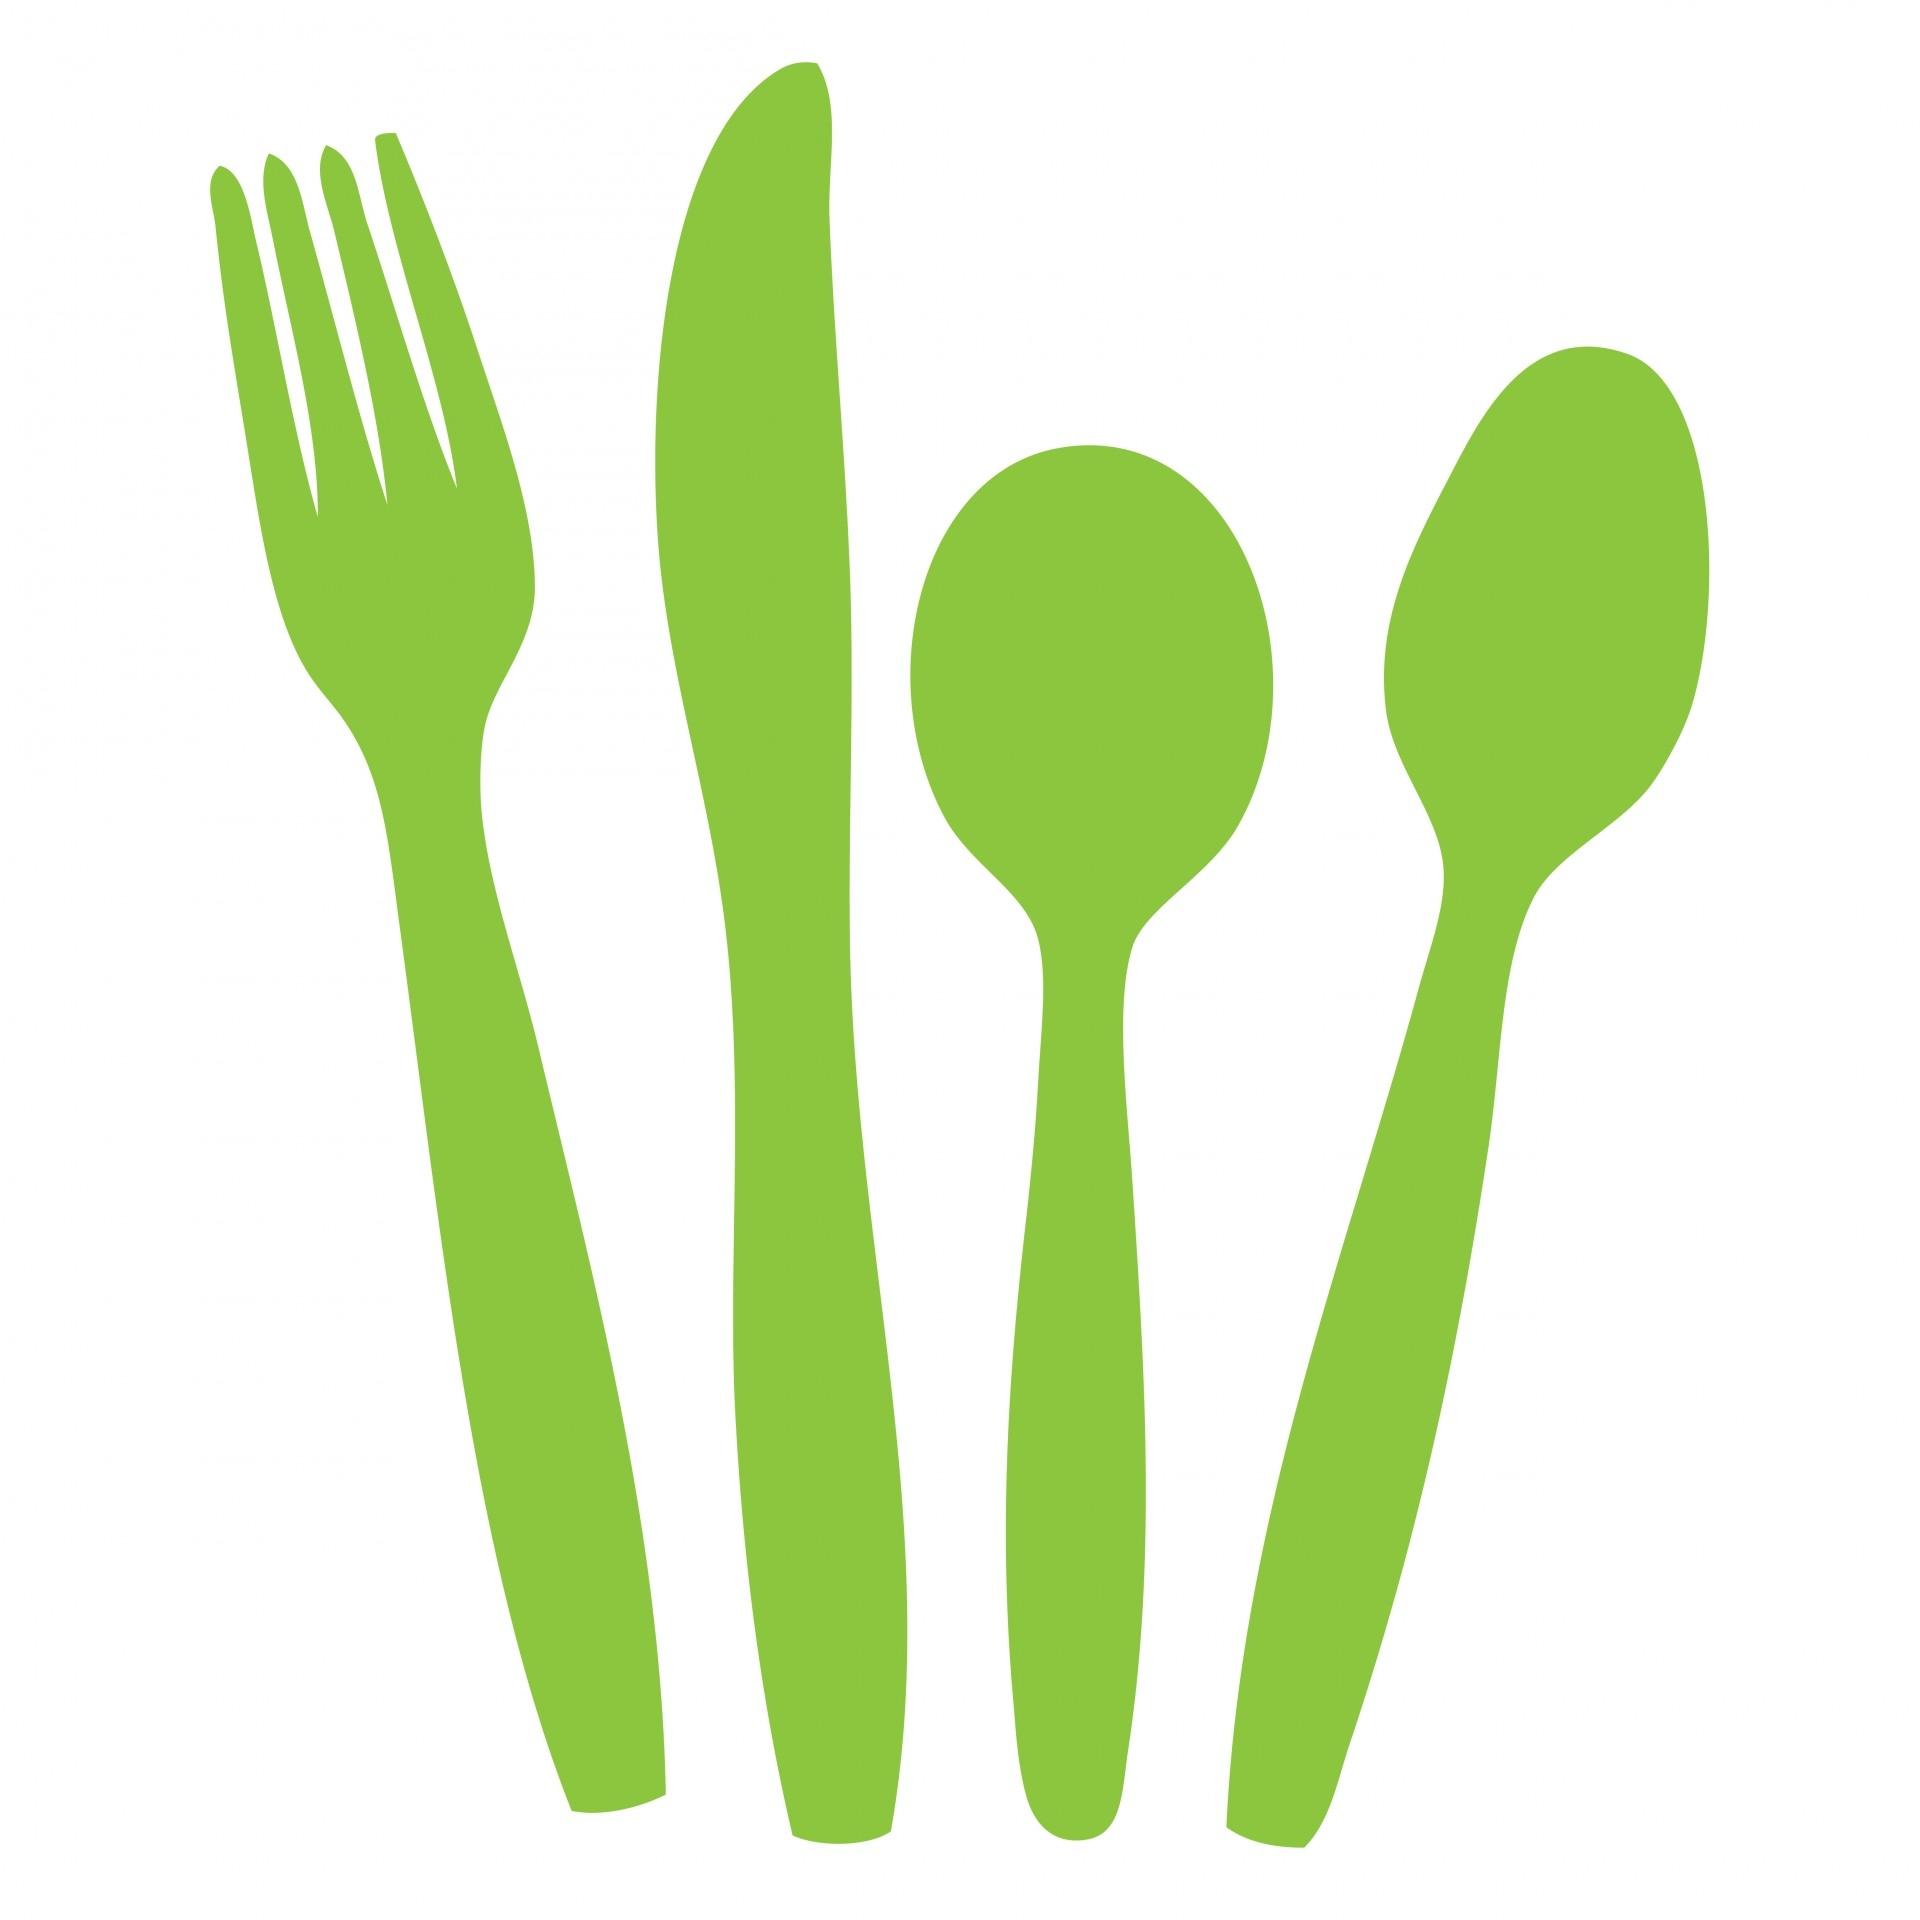 Silverware free cutlery clip art.